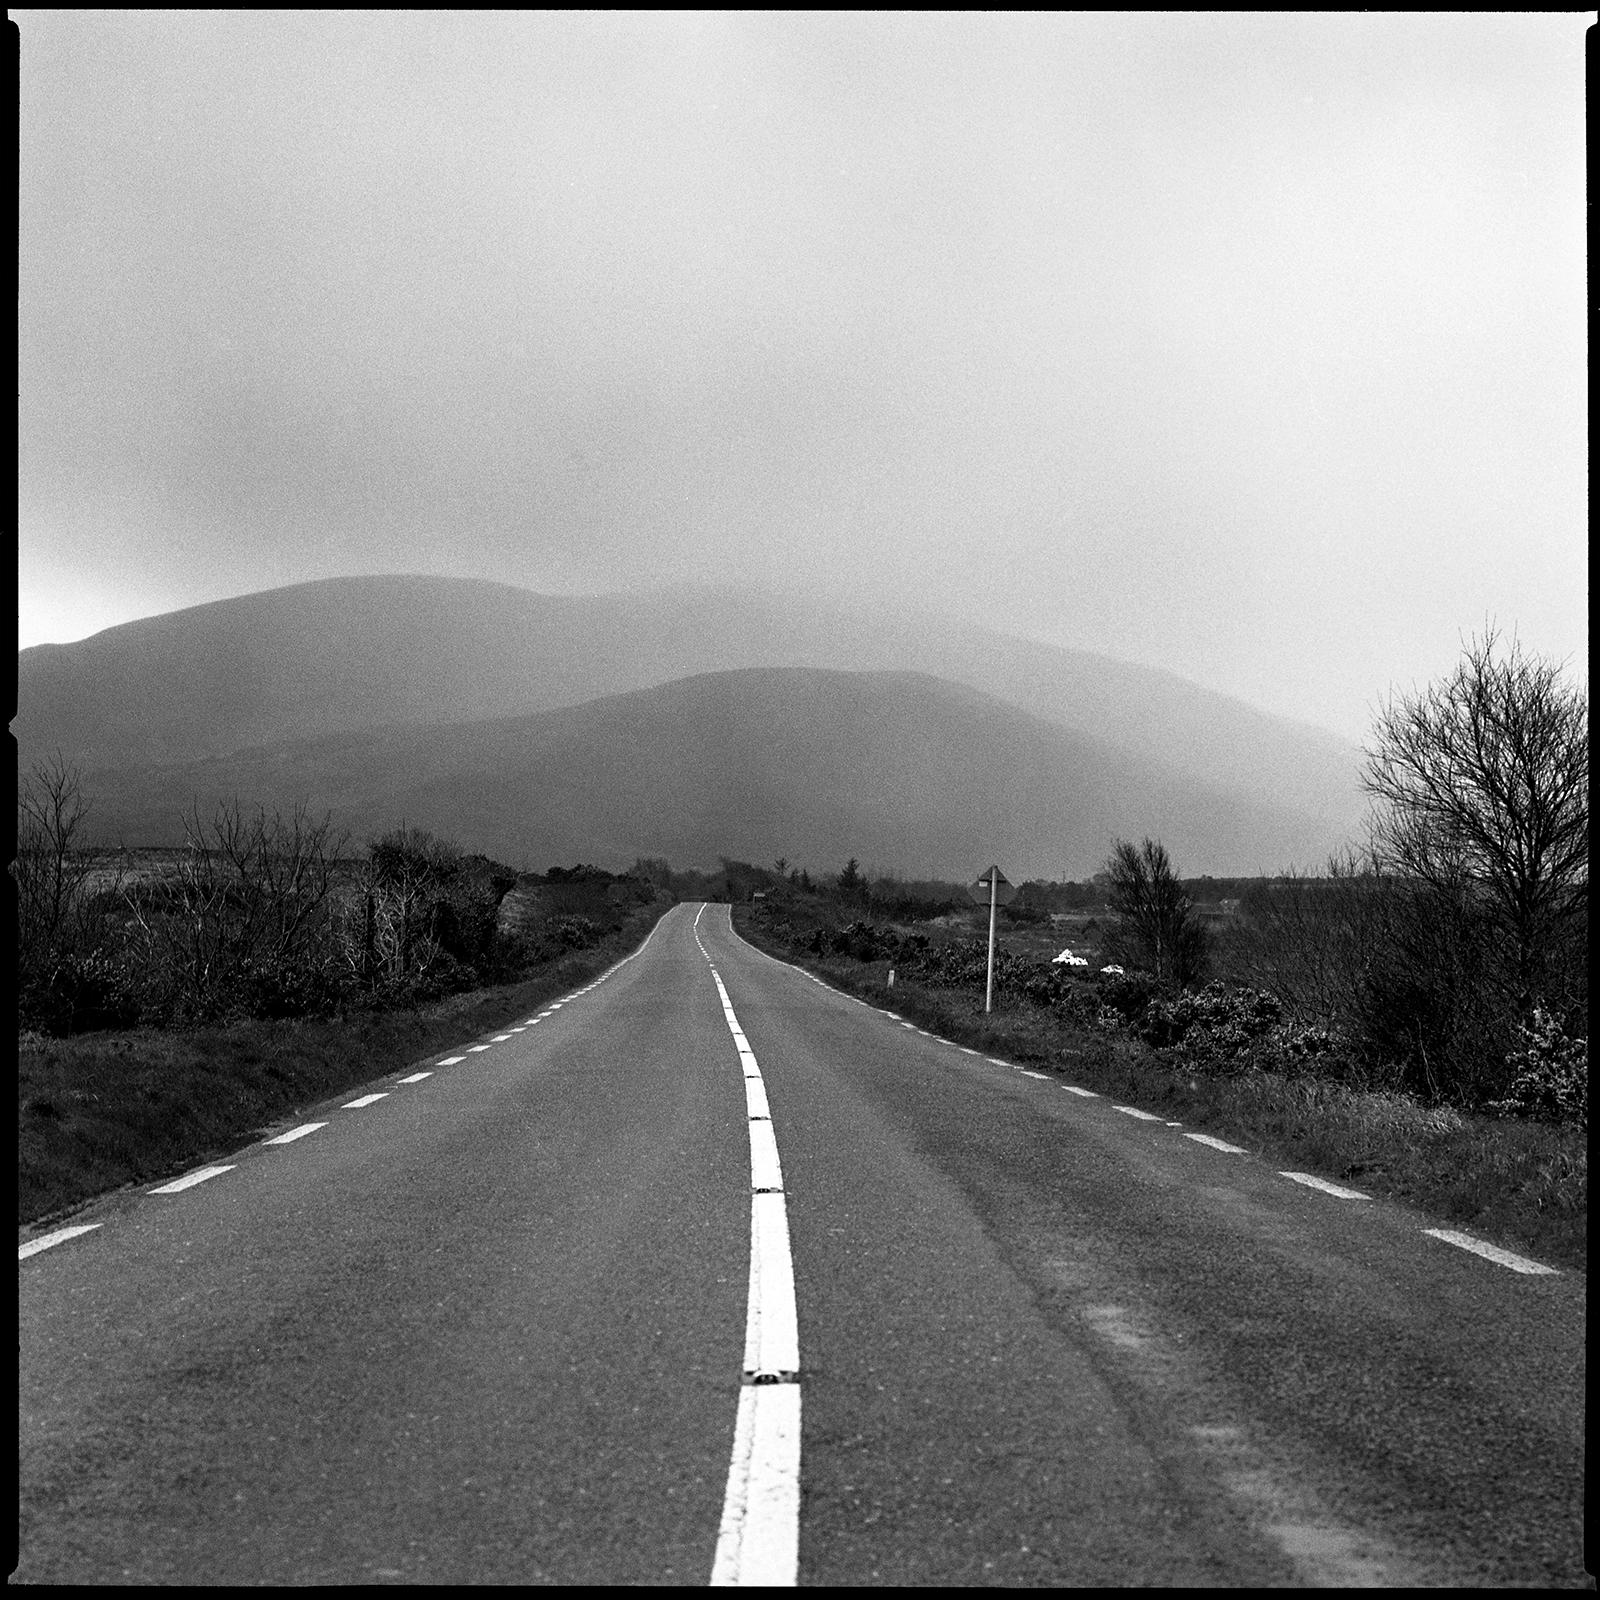 Co. Kerry, Ireland—2008